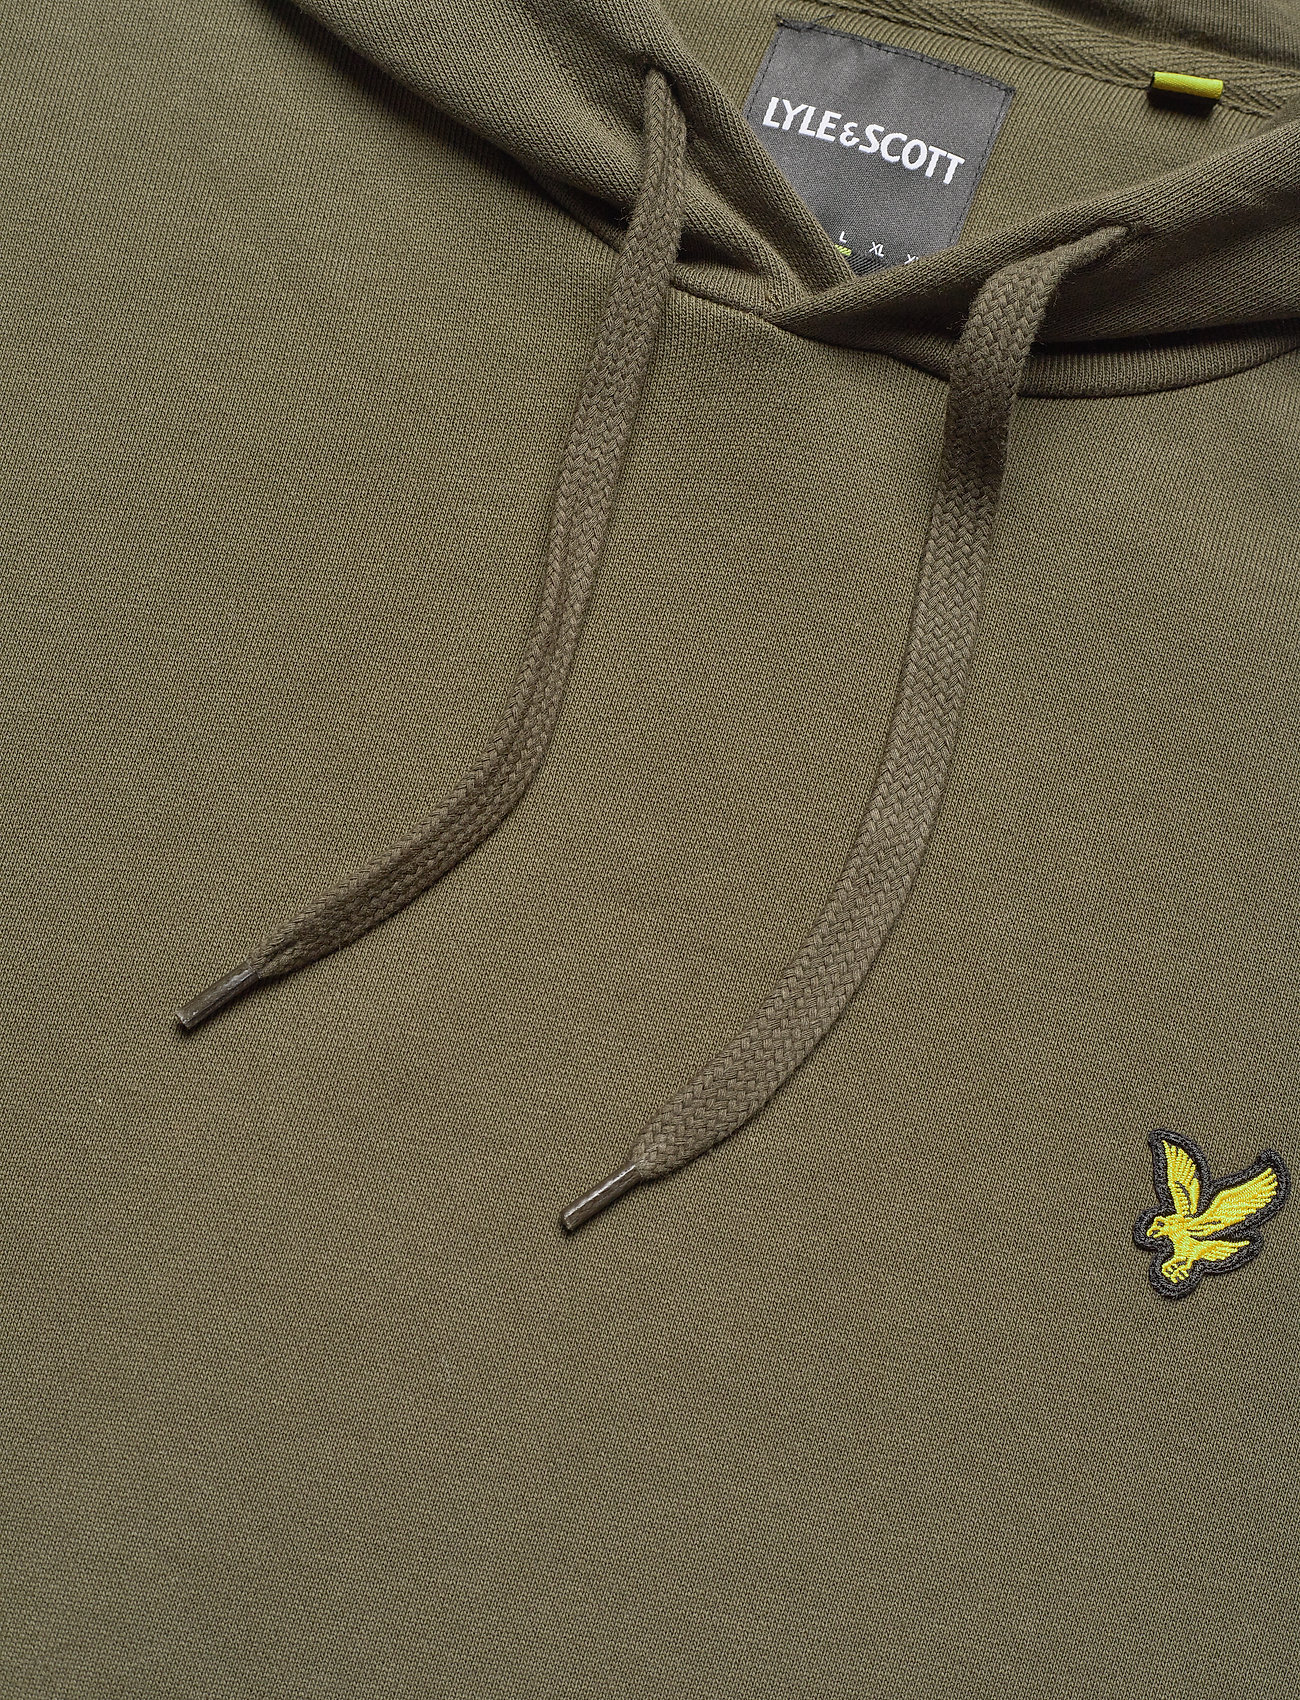 Lyle & Scott Pullover Hoodie - Sweatshirts TREK GREEN - Menn Klær